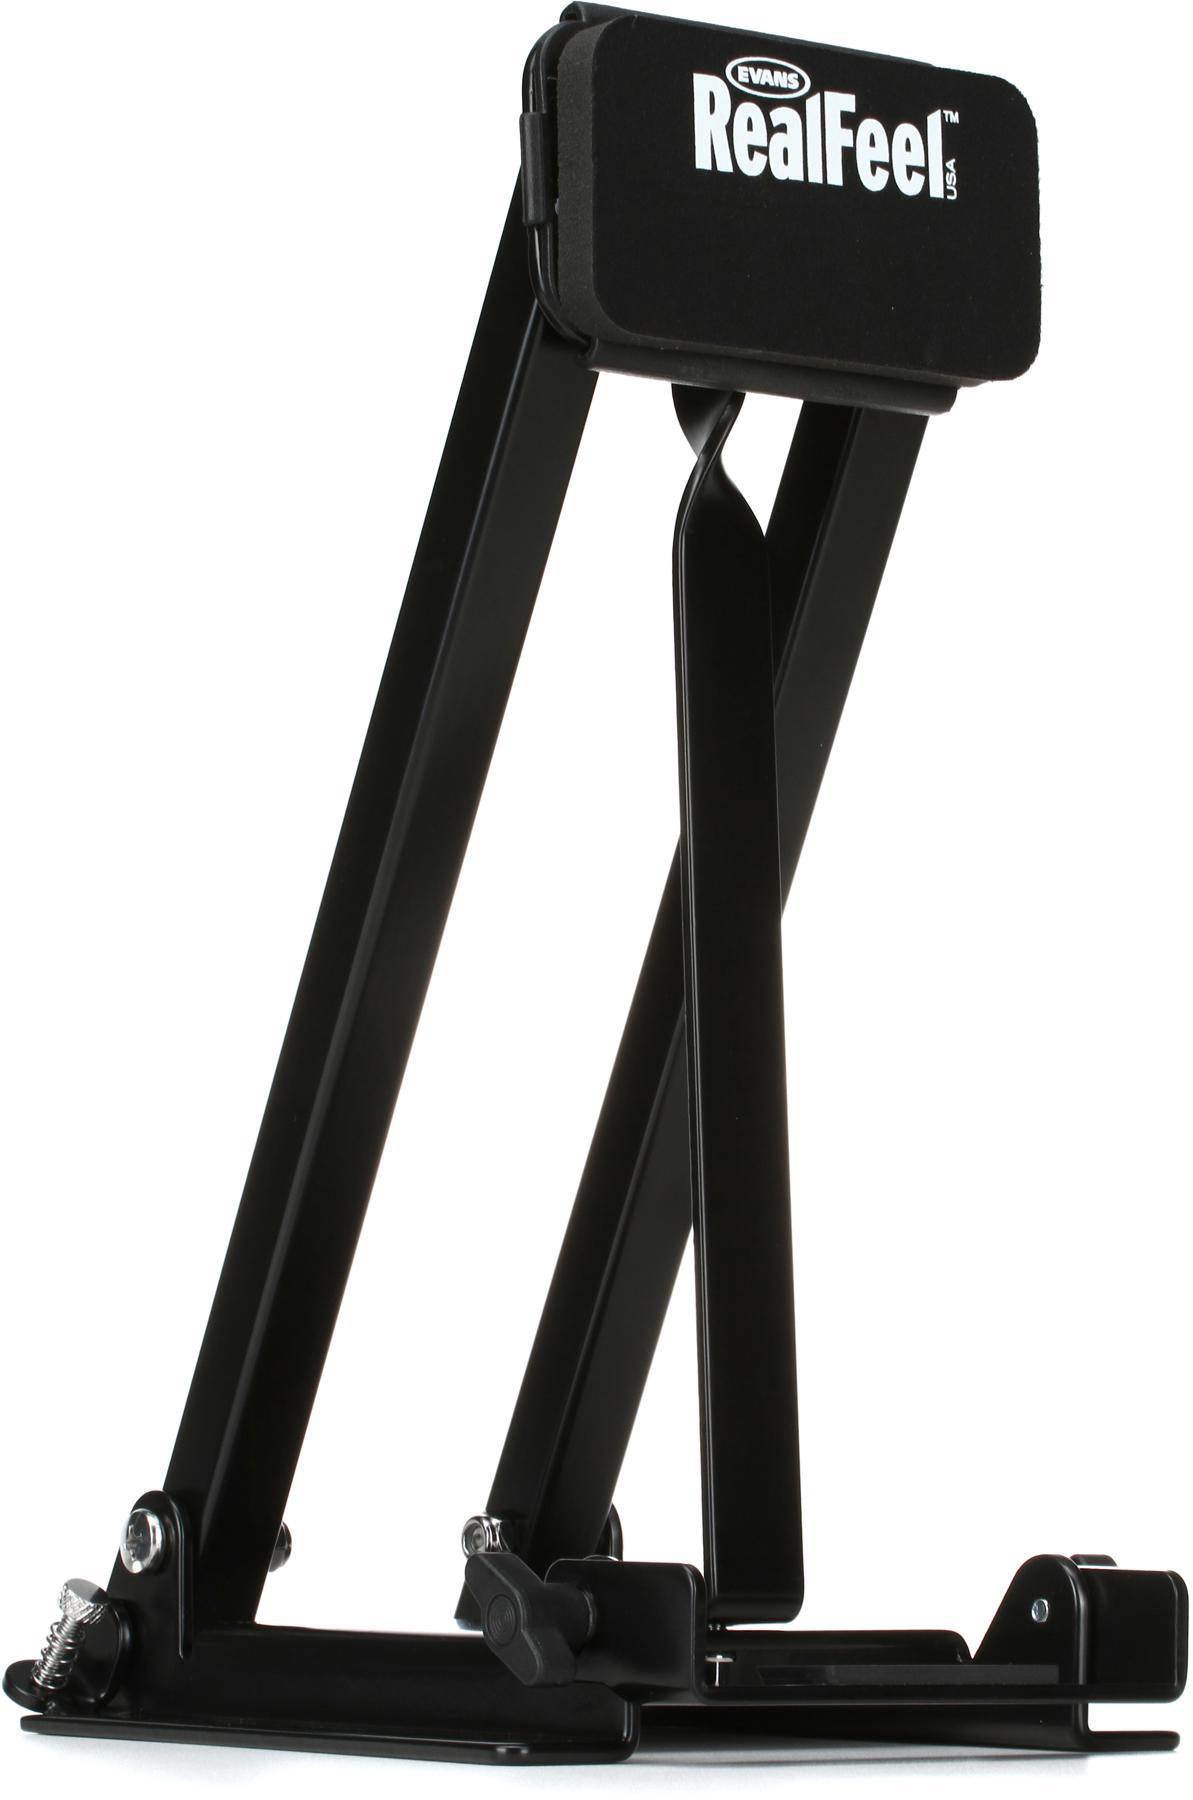 1. Evans RealFeel Folding Bass Pedal Practice Pad